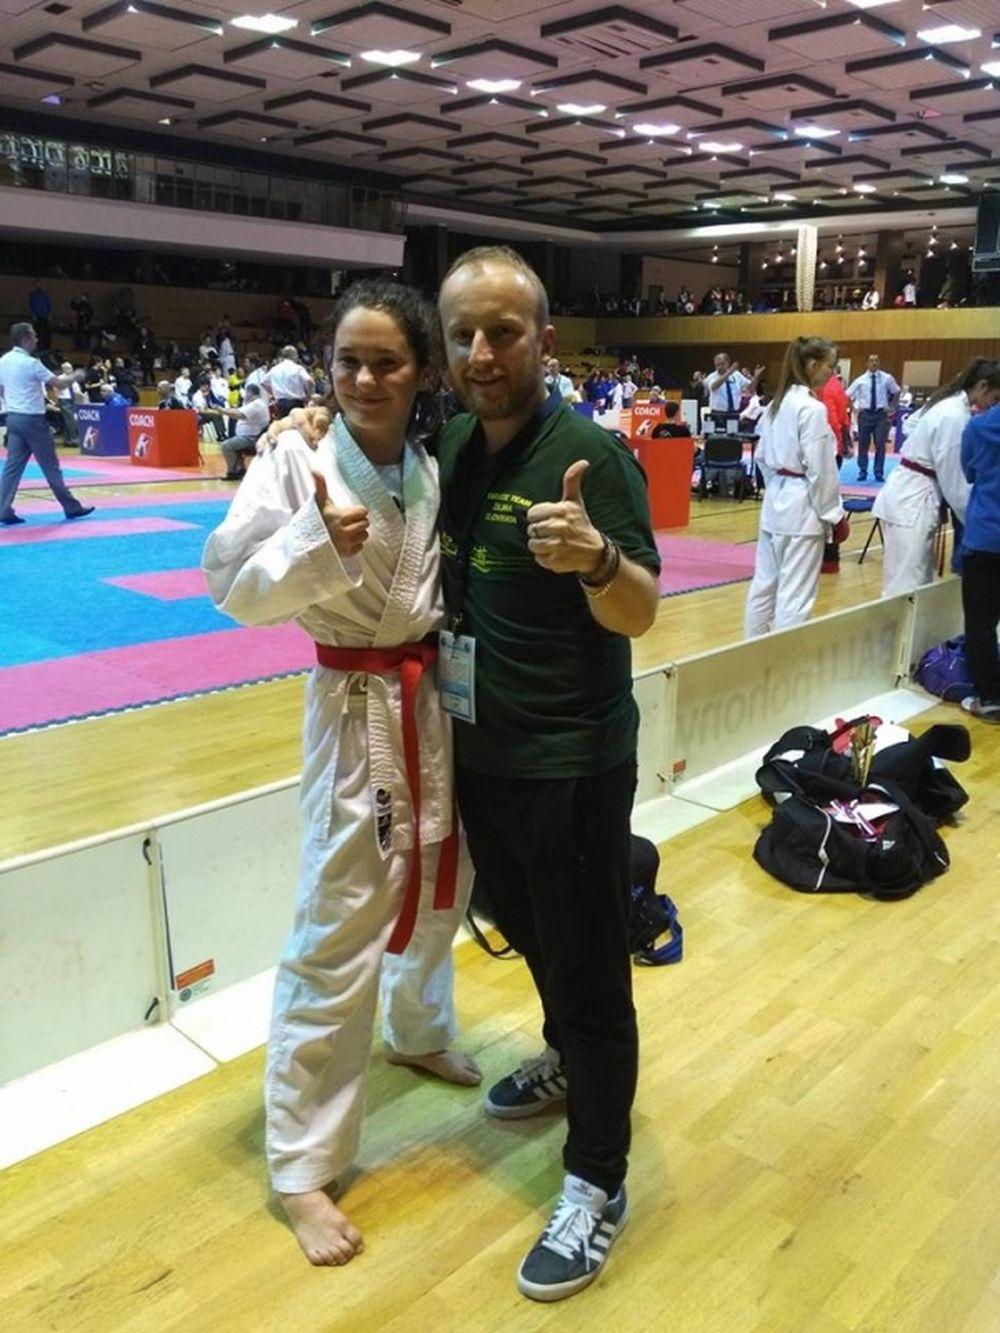 Úspechy Karate klub Žilina Trnava 3.12.2016 - 4.12.2016, foto 7